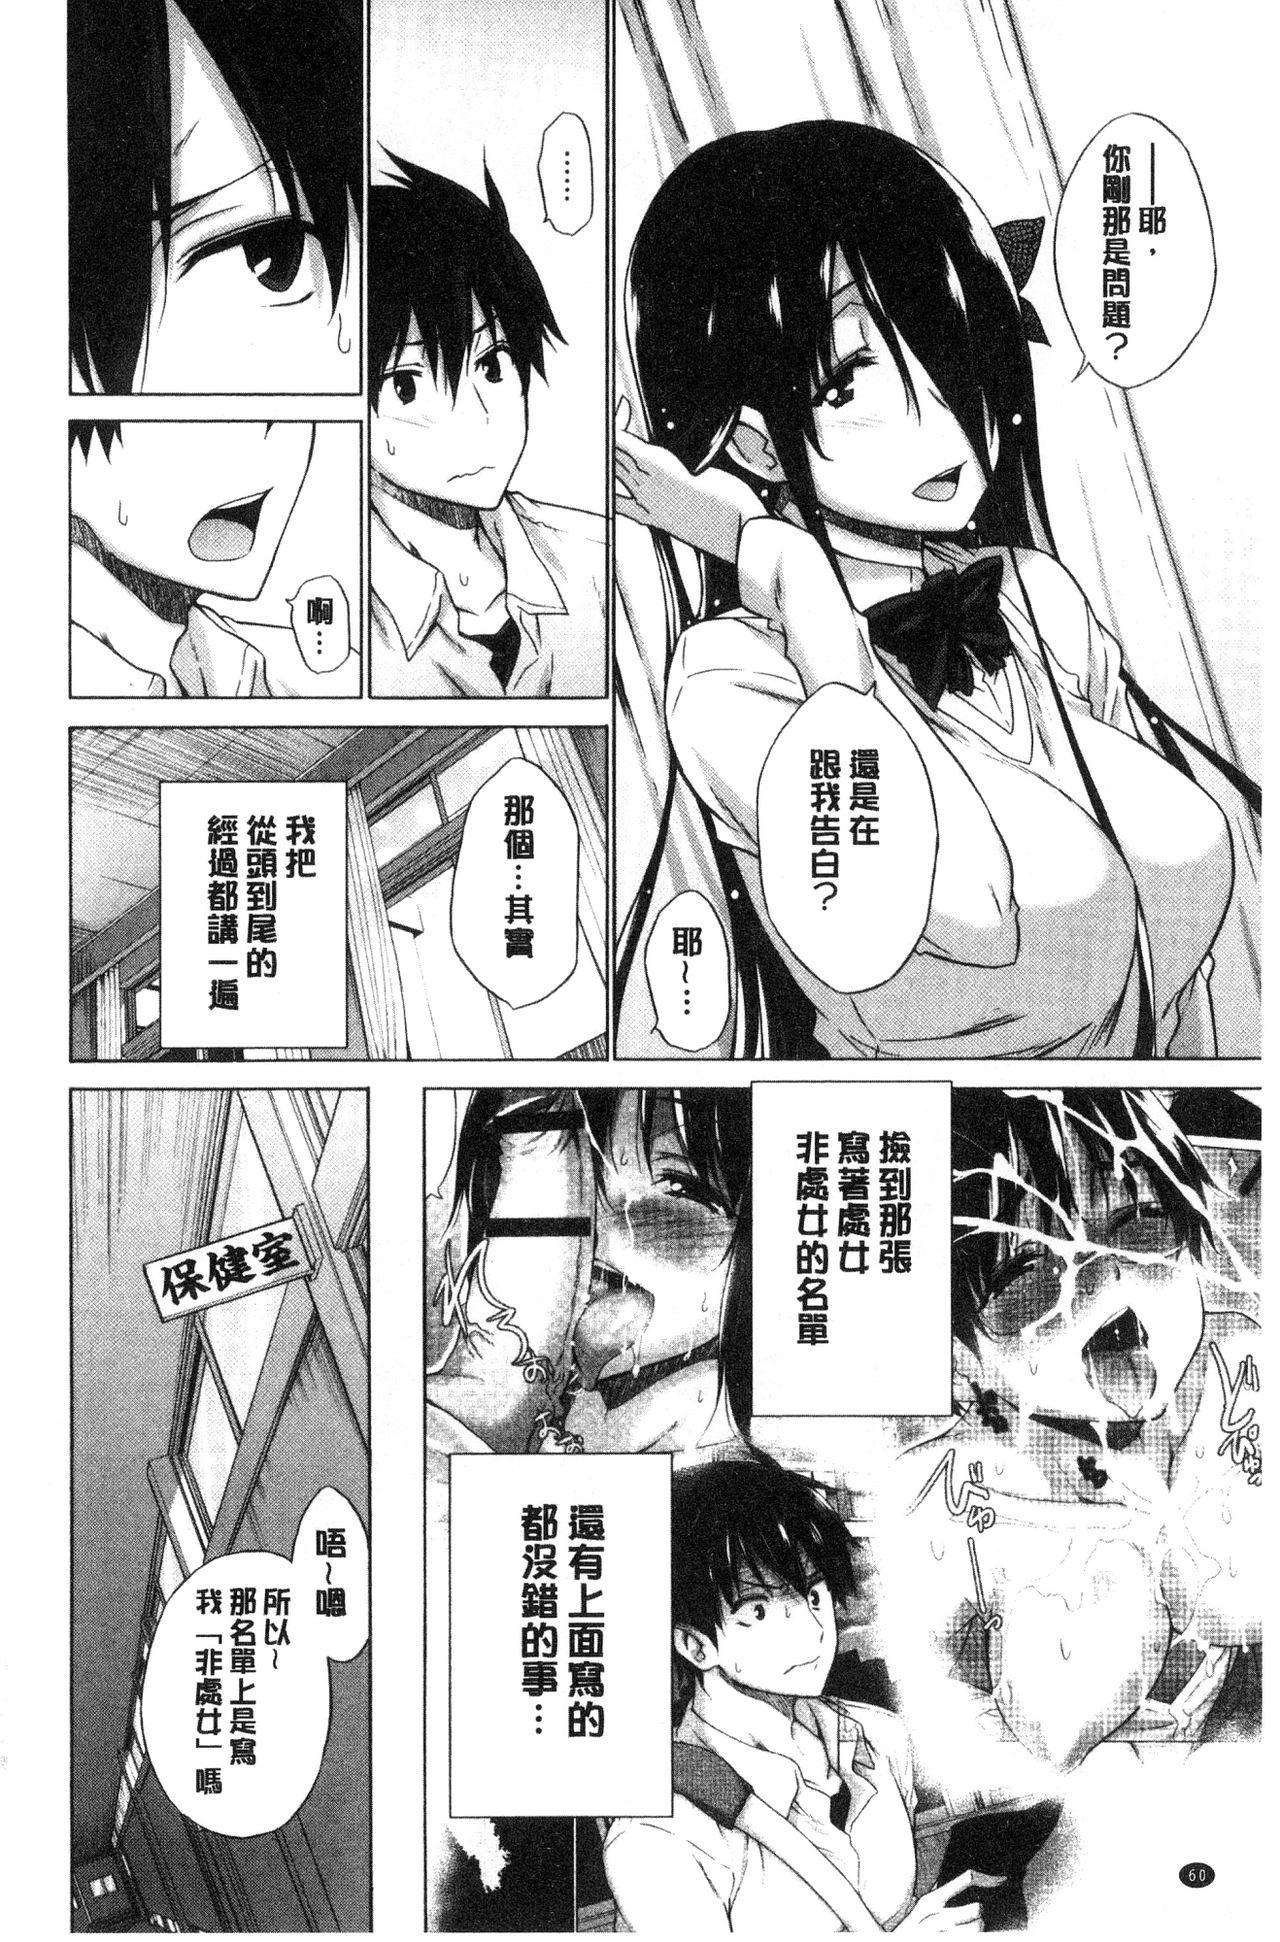 [Miyano Kintarou] Hishoujo List - The Non-Virgin List  | 非處女的名單 [Chinese] 61